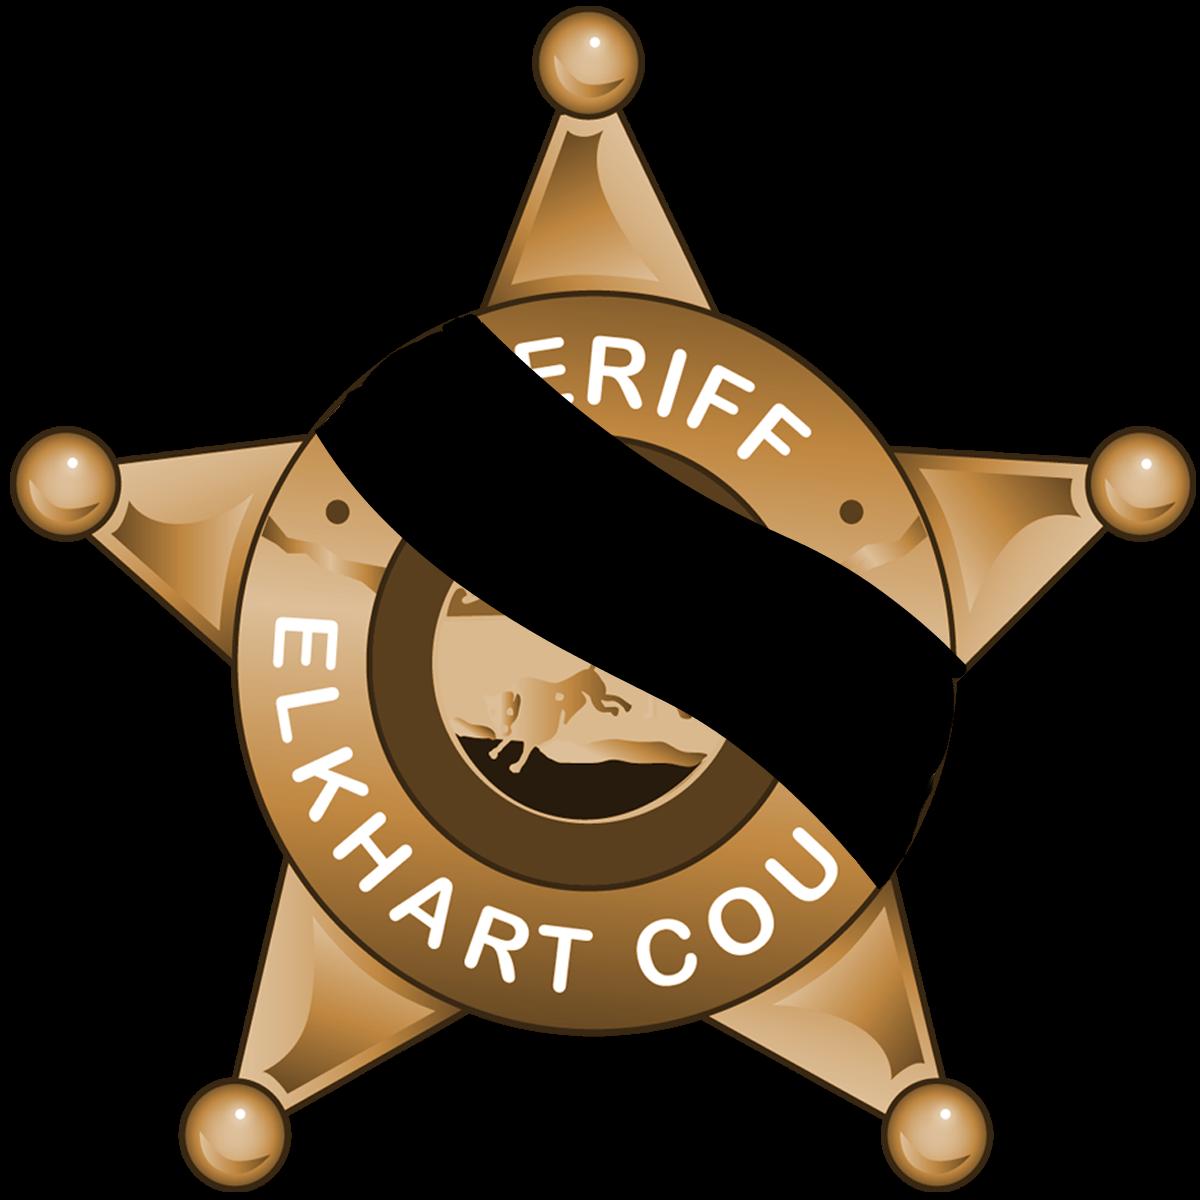 Police memorial elkhart county. Policeman clipart jail guard